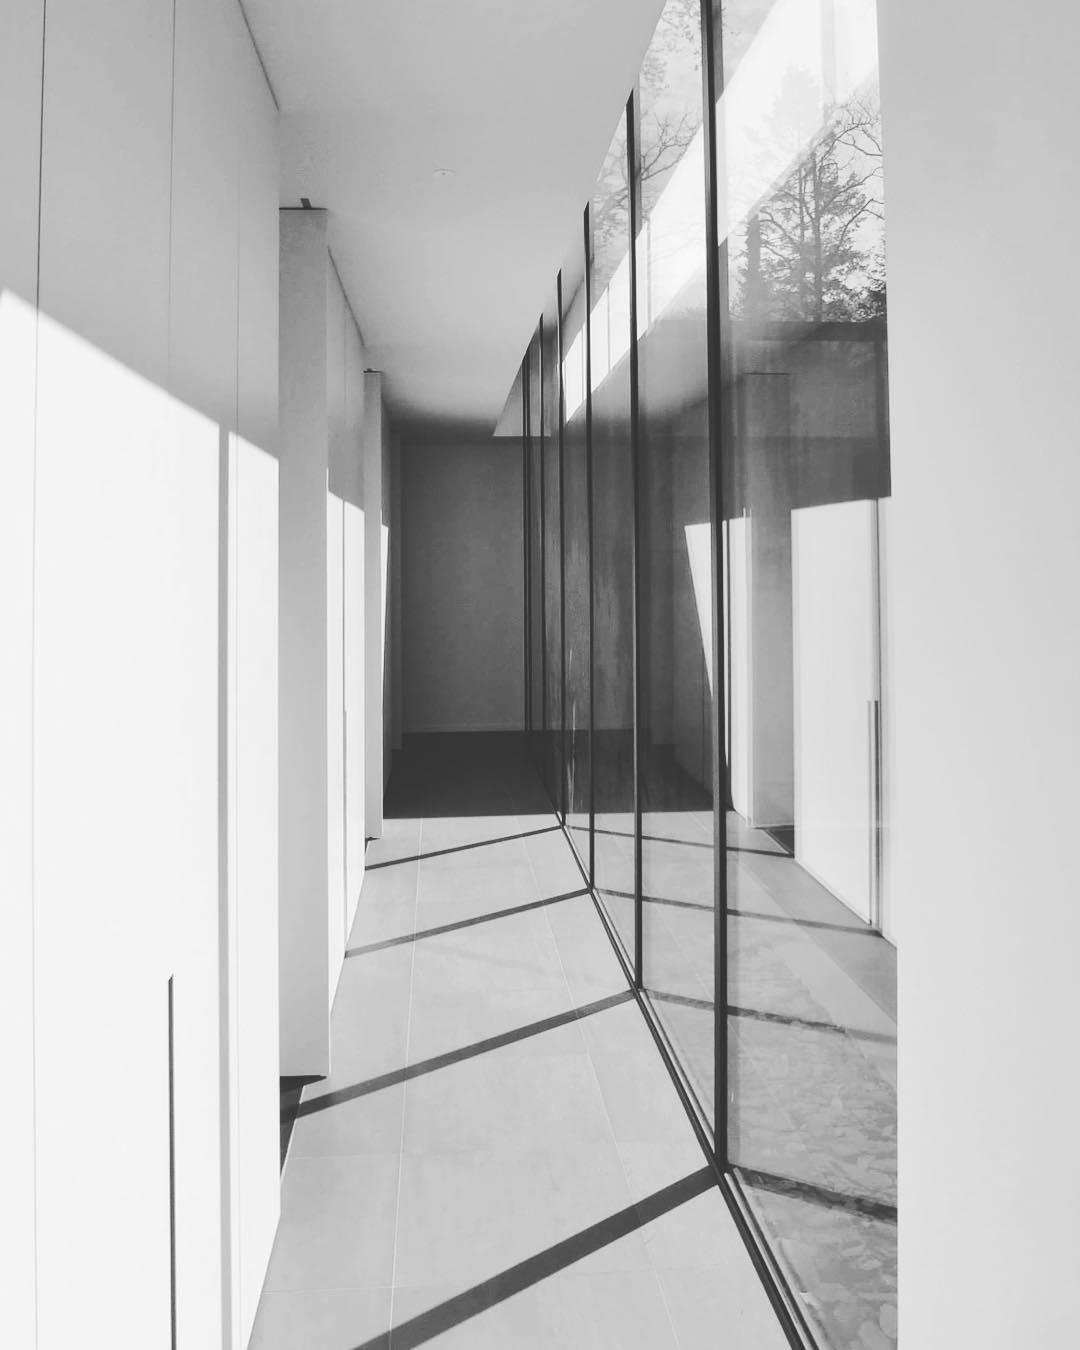 2018 01 25 BeX2HZvlVZP 1700065387545450063 | Baeyens & Beck architecten Gent | architect nieuwbouw renovatie interieur | high end | architectenbureau